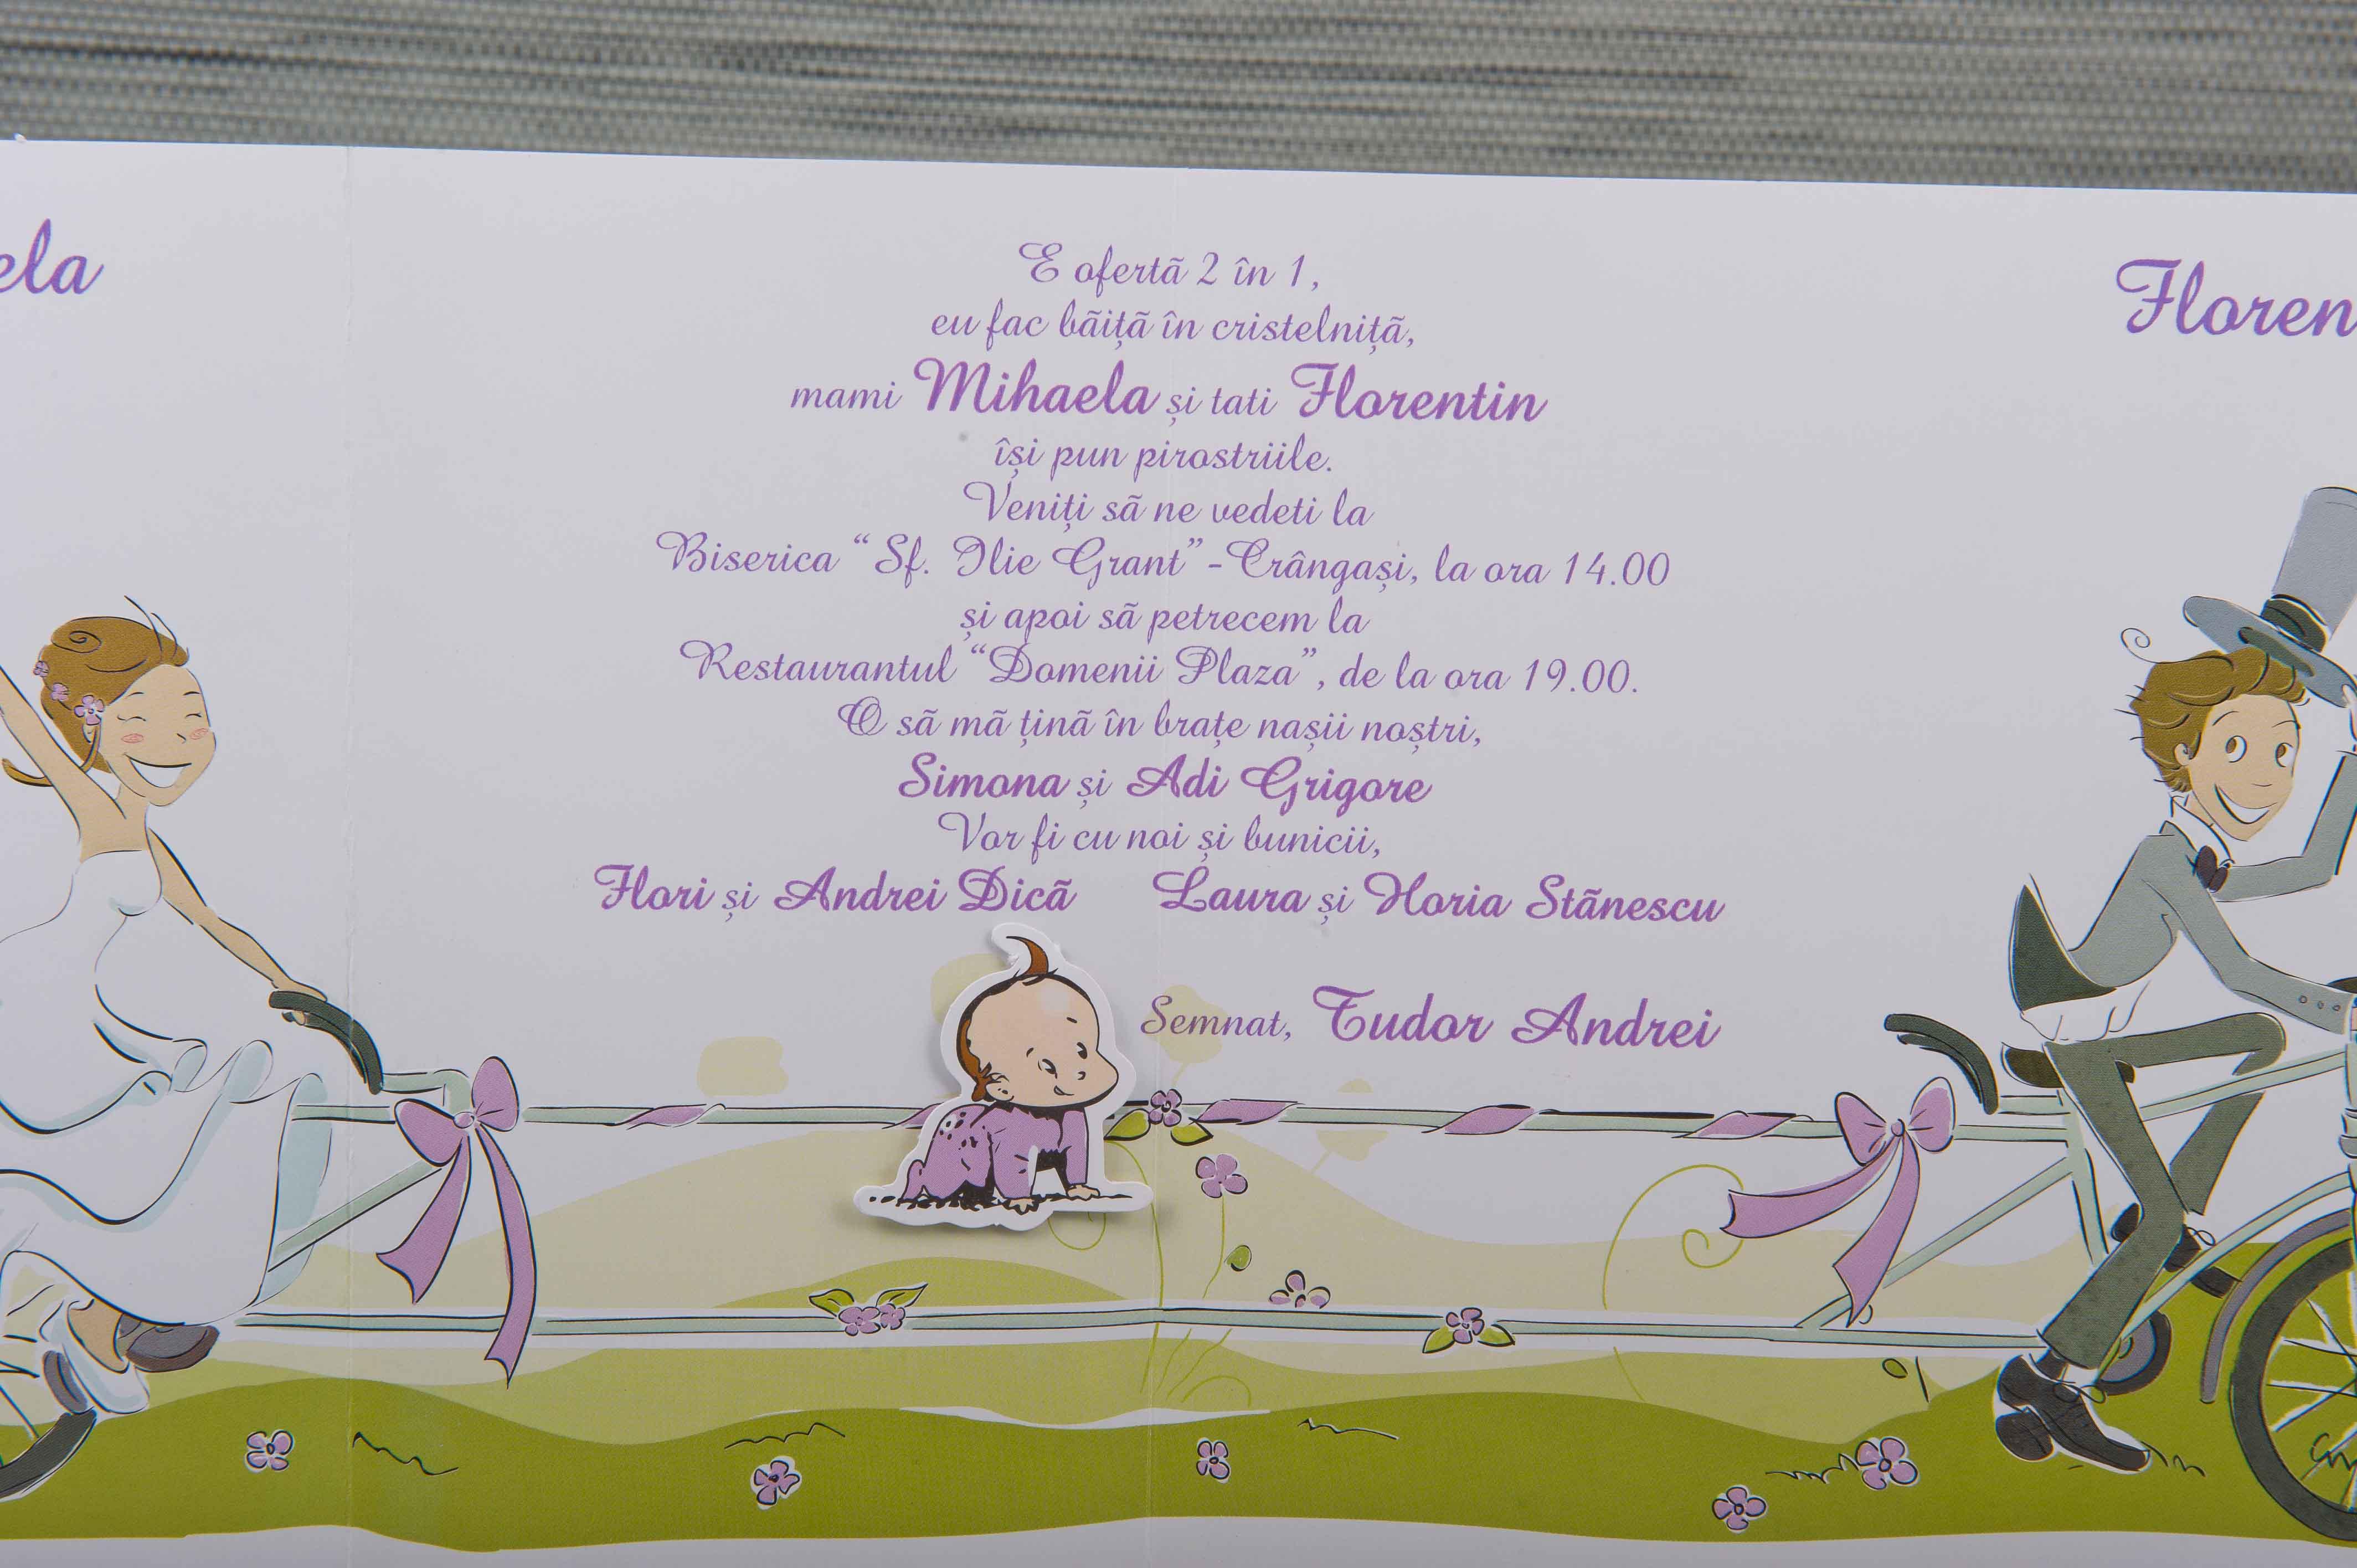 1049 2 In 1 Invitatii Nunta Invitatii Botez Marturii Plicuri